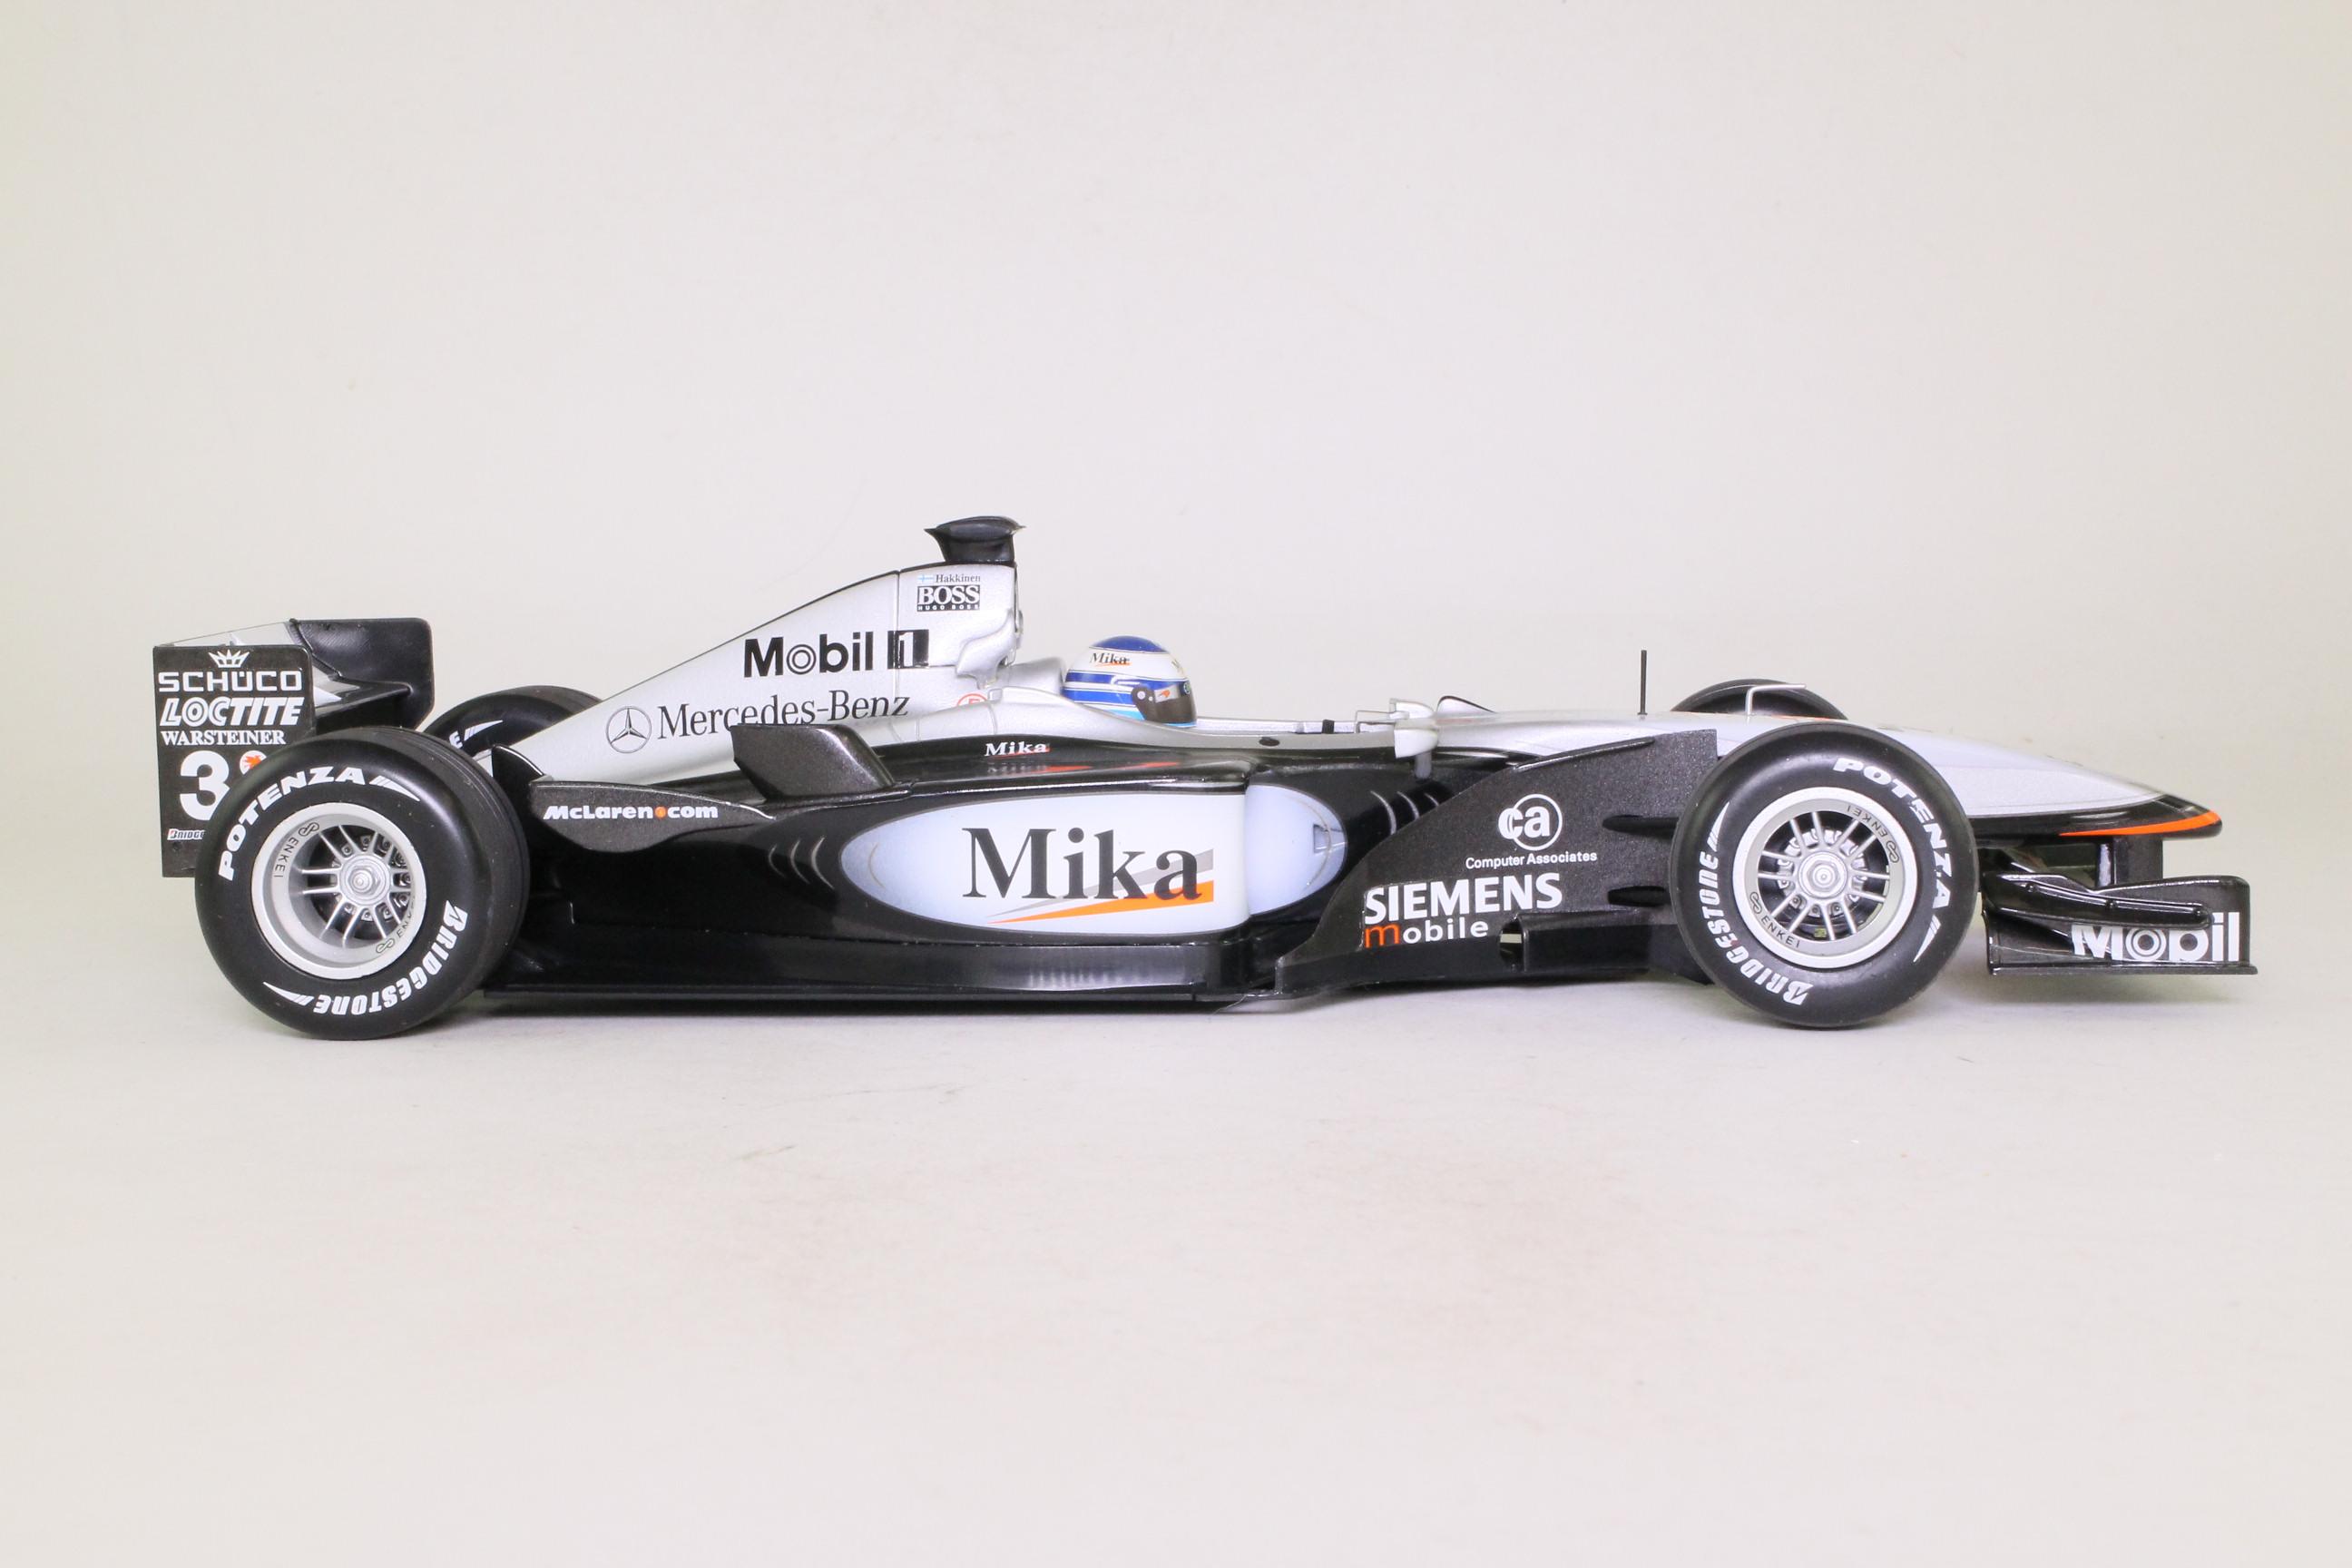 Minichamps 530 011803; McLaren MP4-16; 2001 British GP 1st; Mika Hakkinen; RN3